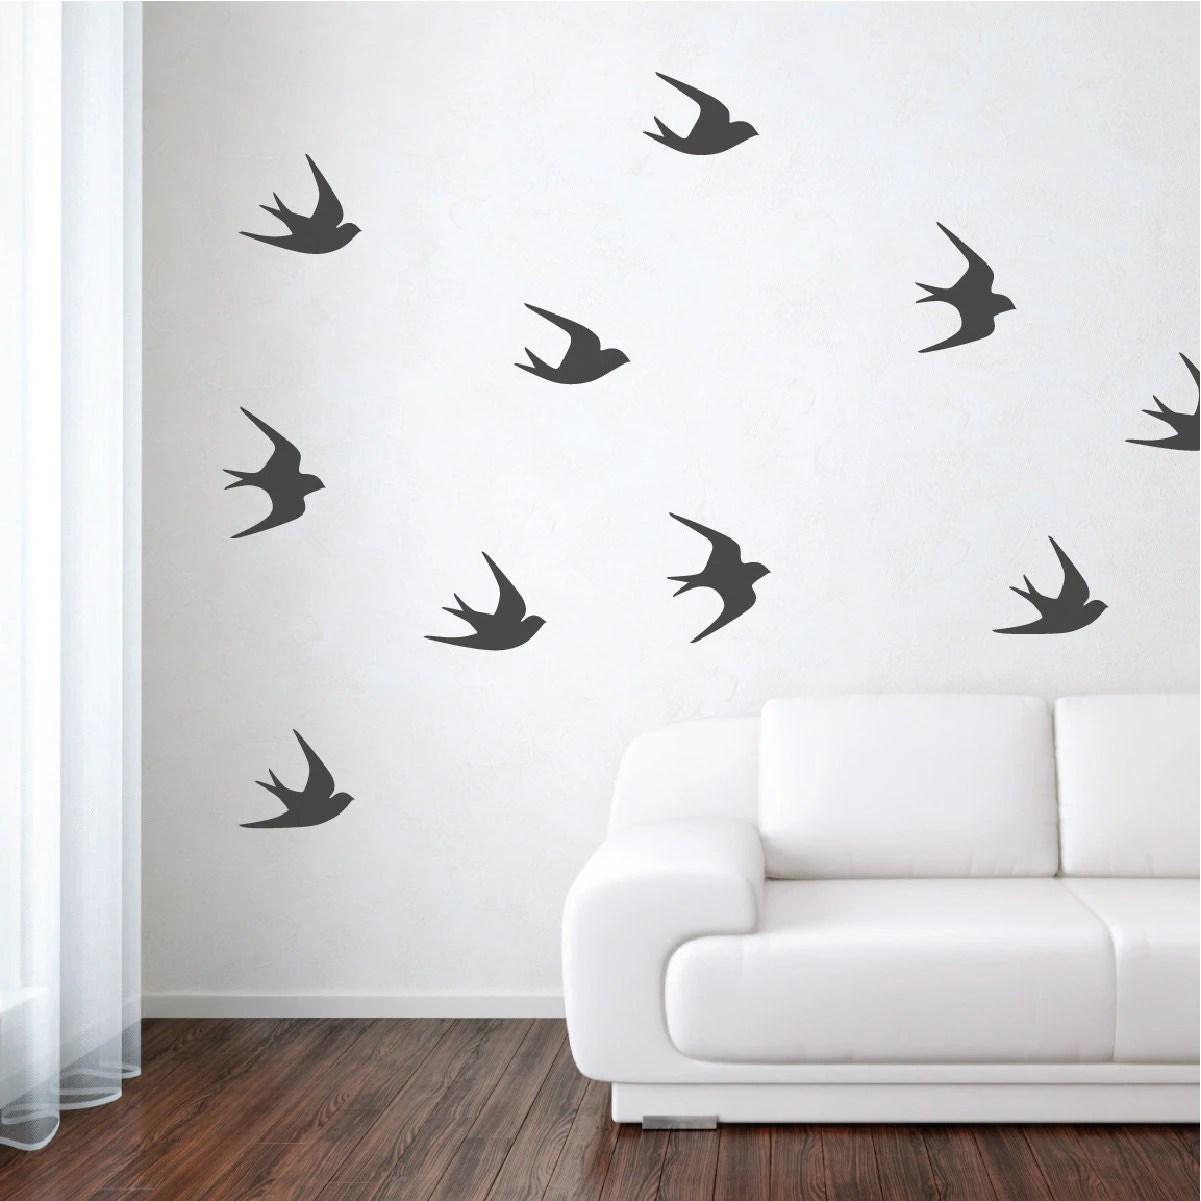 Sparrow Bird Wall Decals